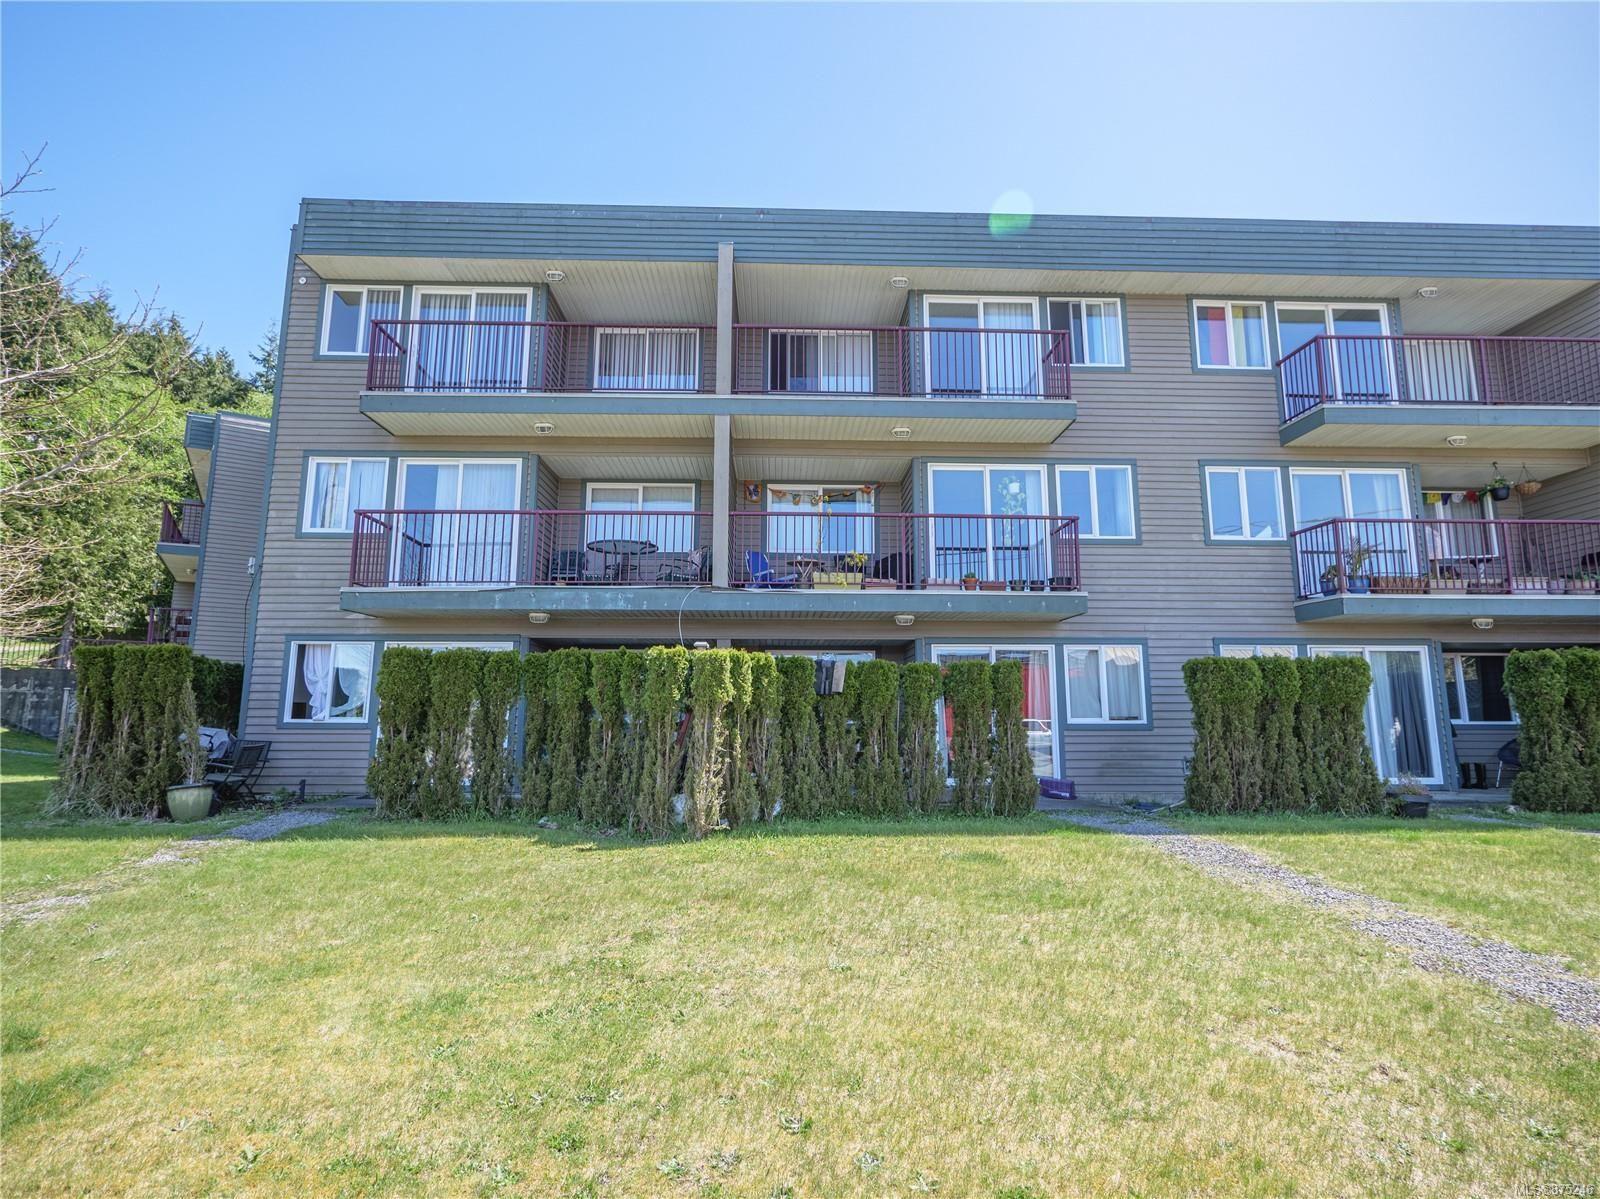 Main Photo: 105 250 Hemlock St in : PA Ucluelet Condo for sale (Port Alberni)  : MLS®# 875246